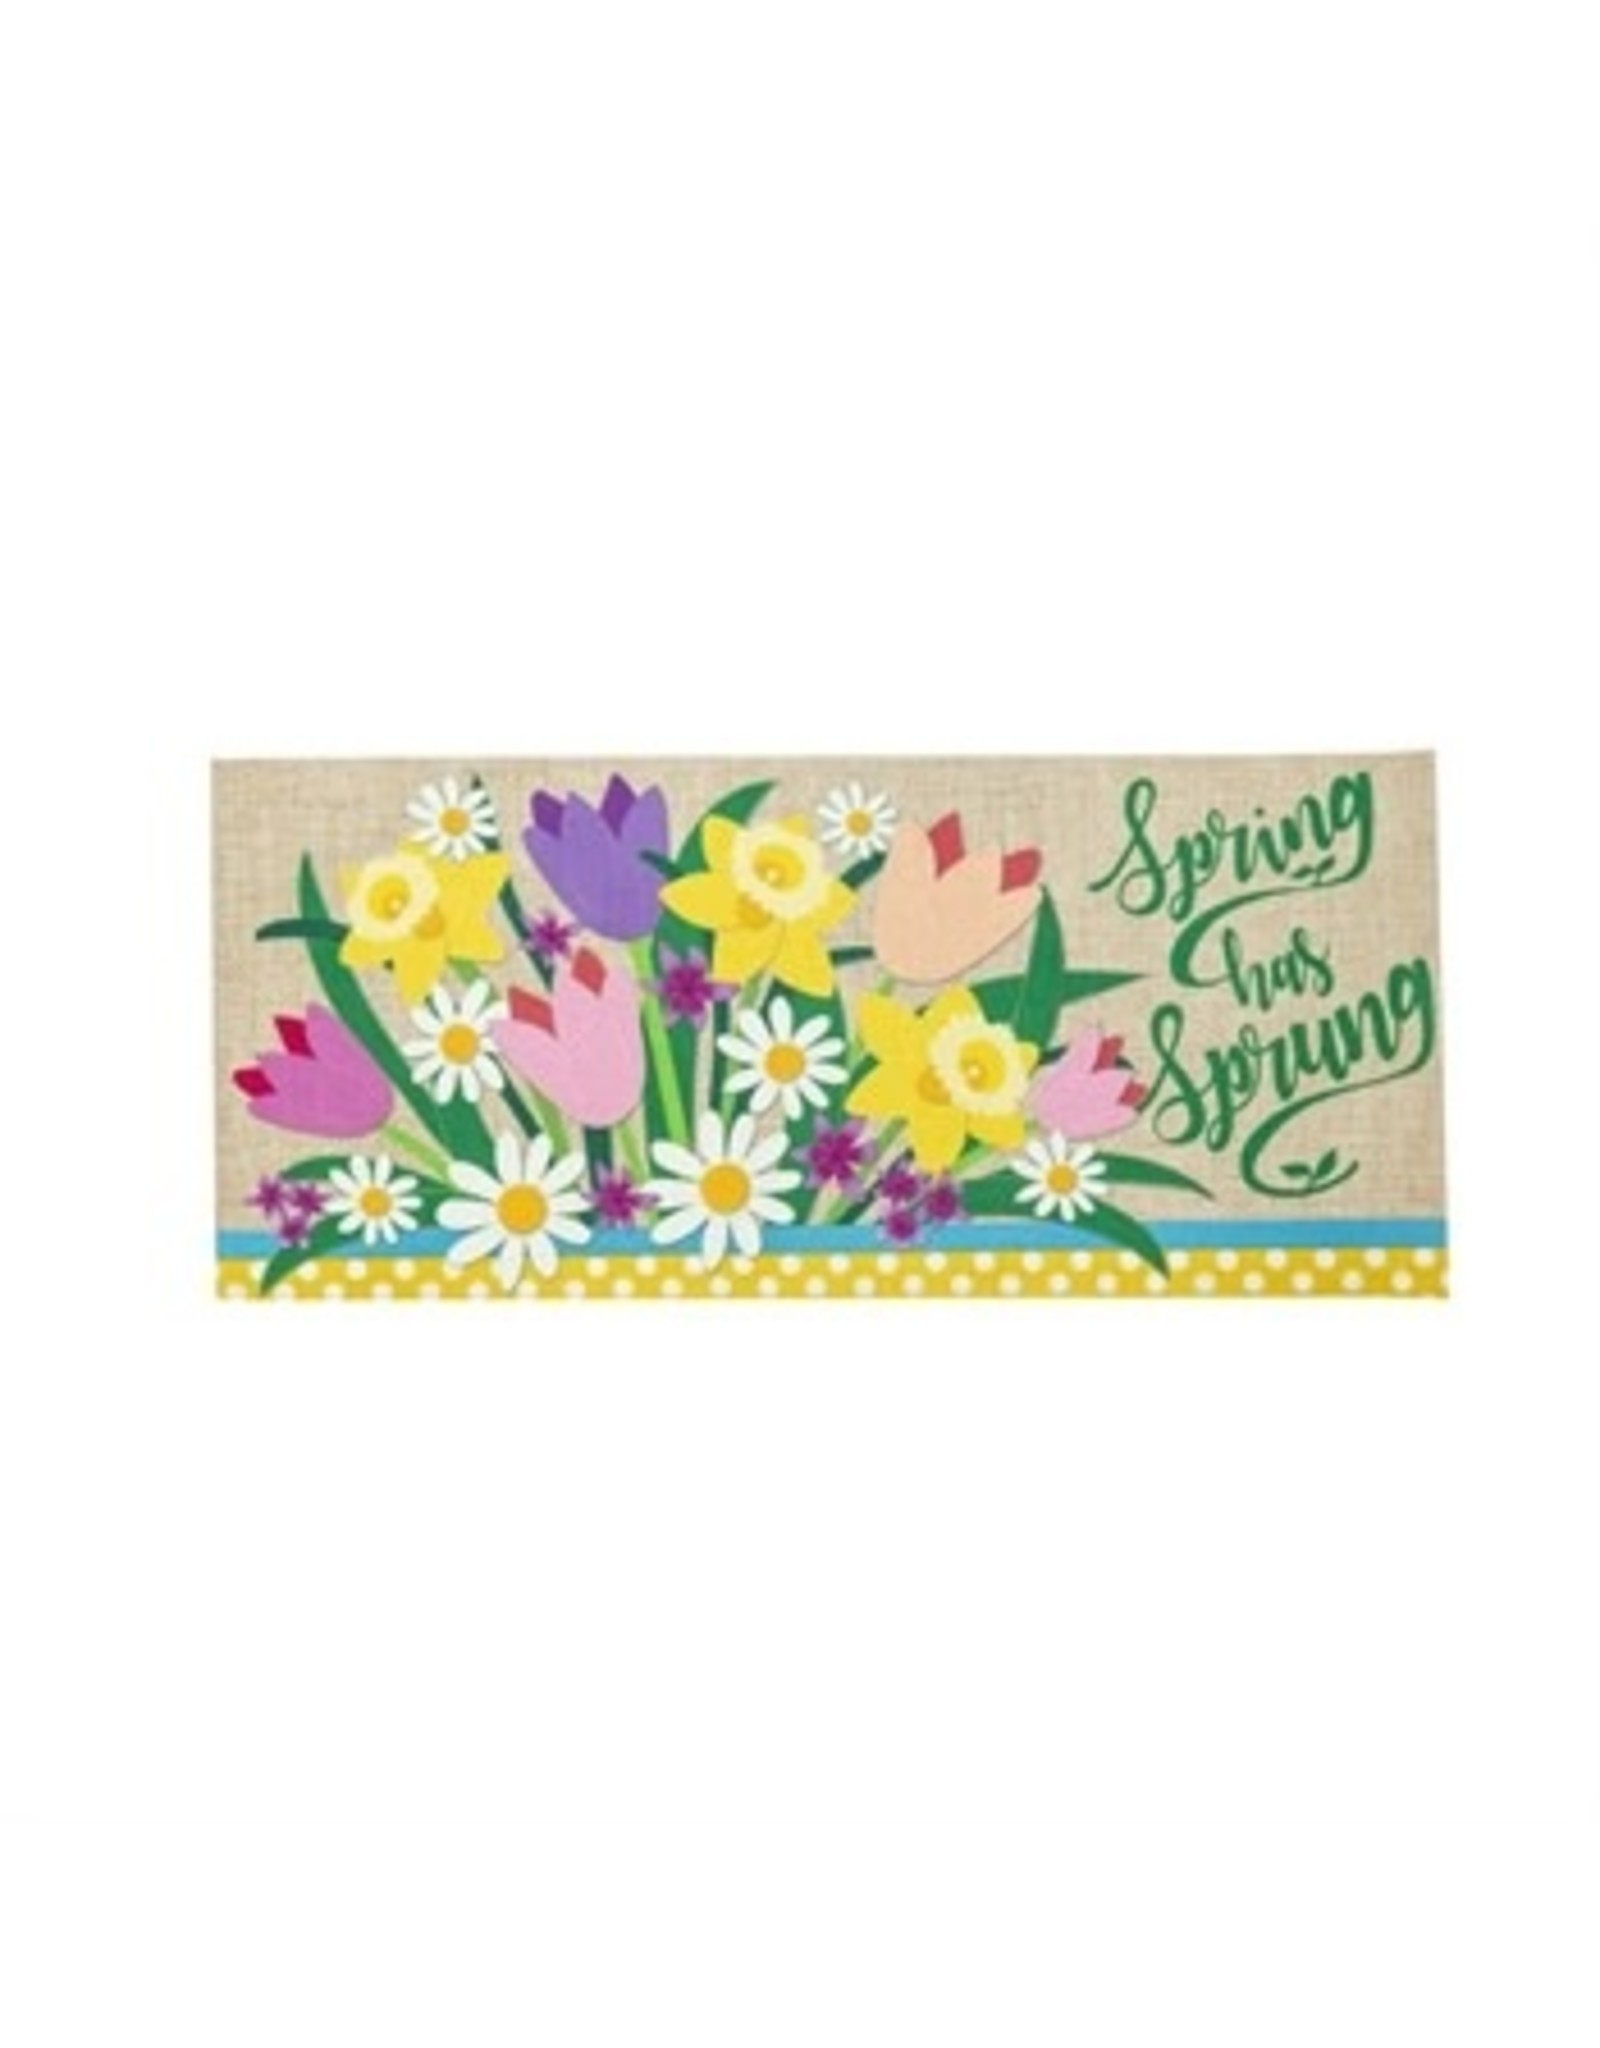 Switch Mat Insert- Spring Has Sprung